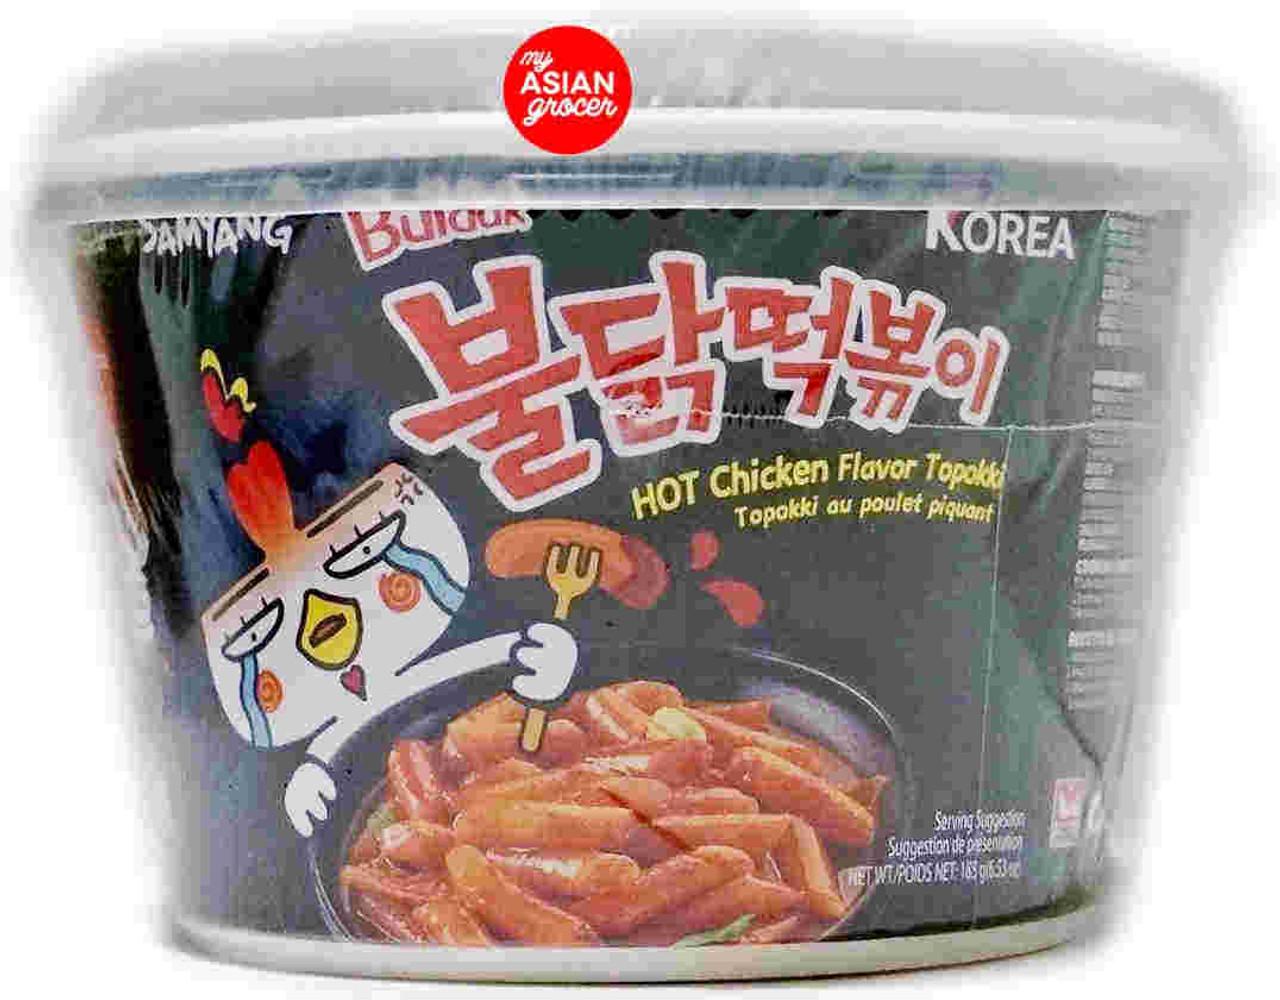 Samyang Buldak Hot Chicken Flavor Topokki 185g